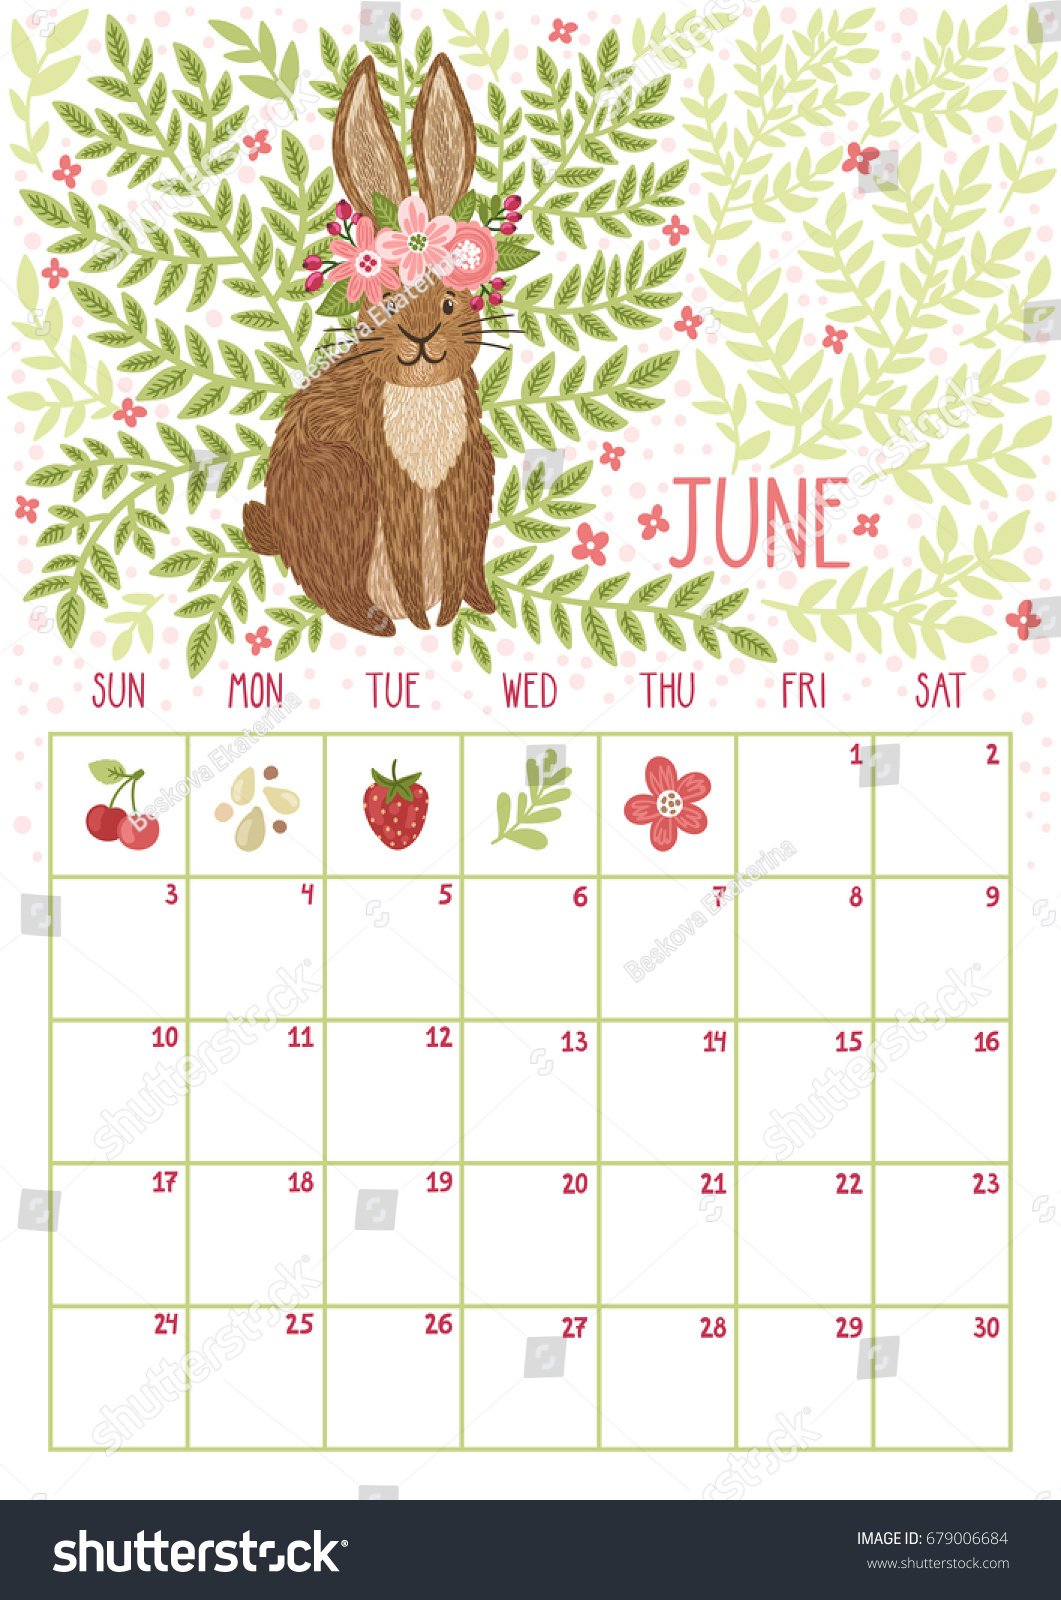 June Calendar Images : Vector monthly calendar cute rabbit june stock